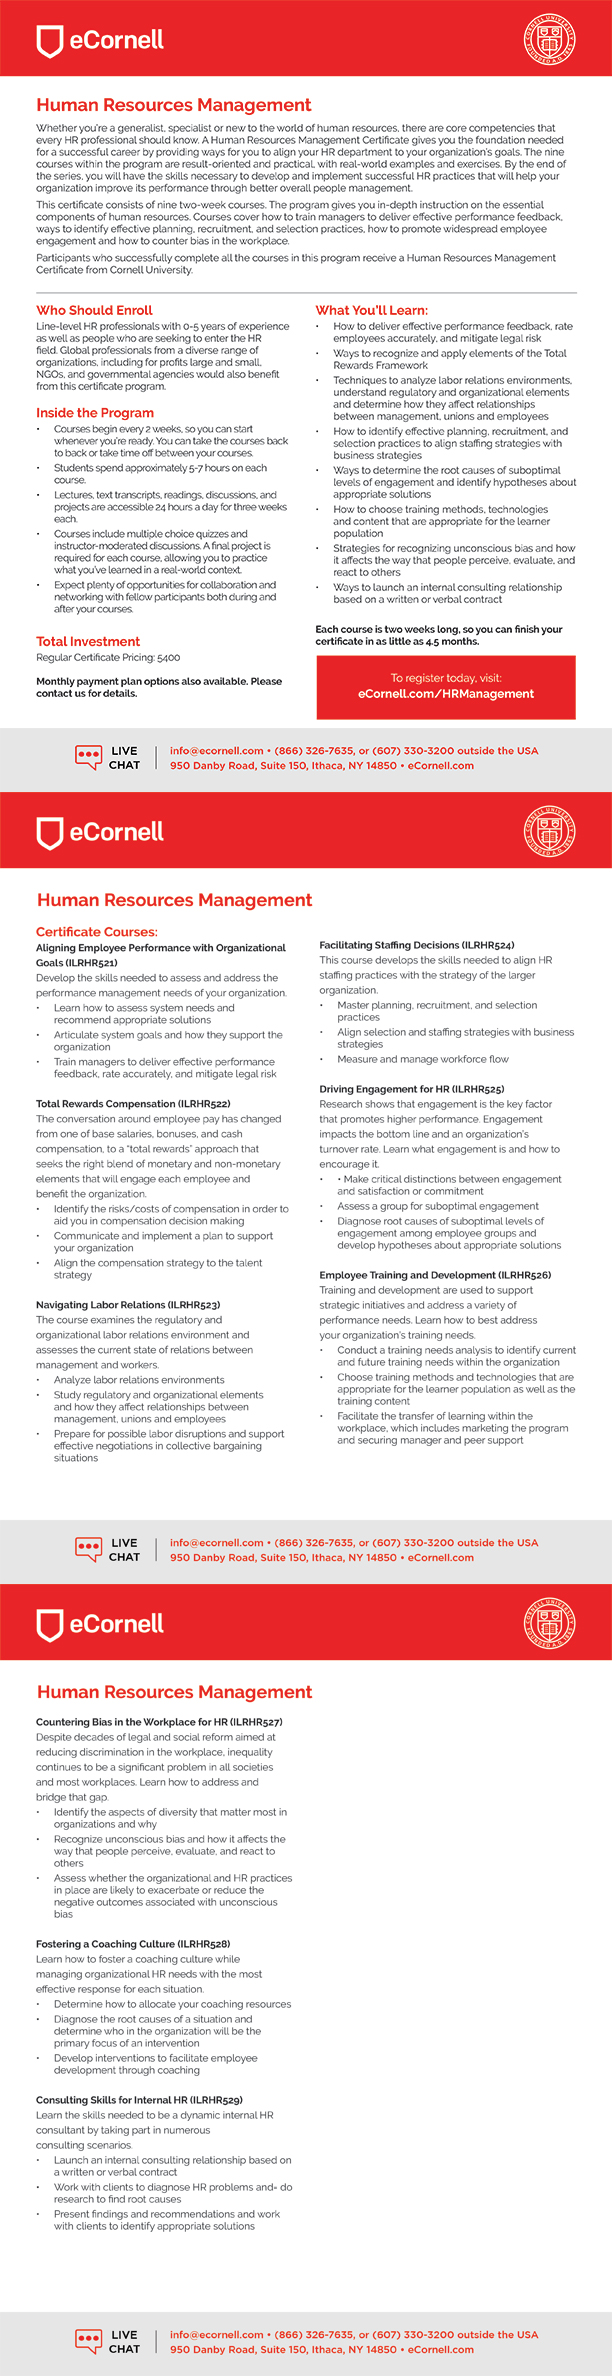 Human Resources Management Flyer